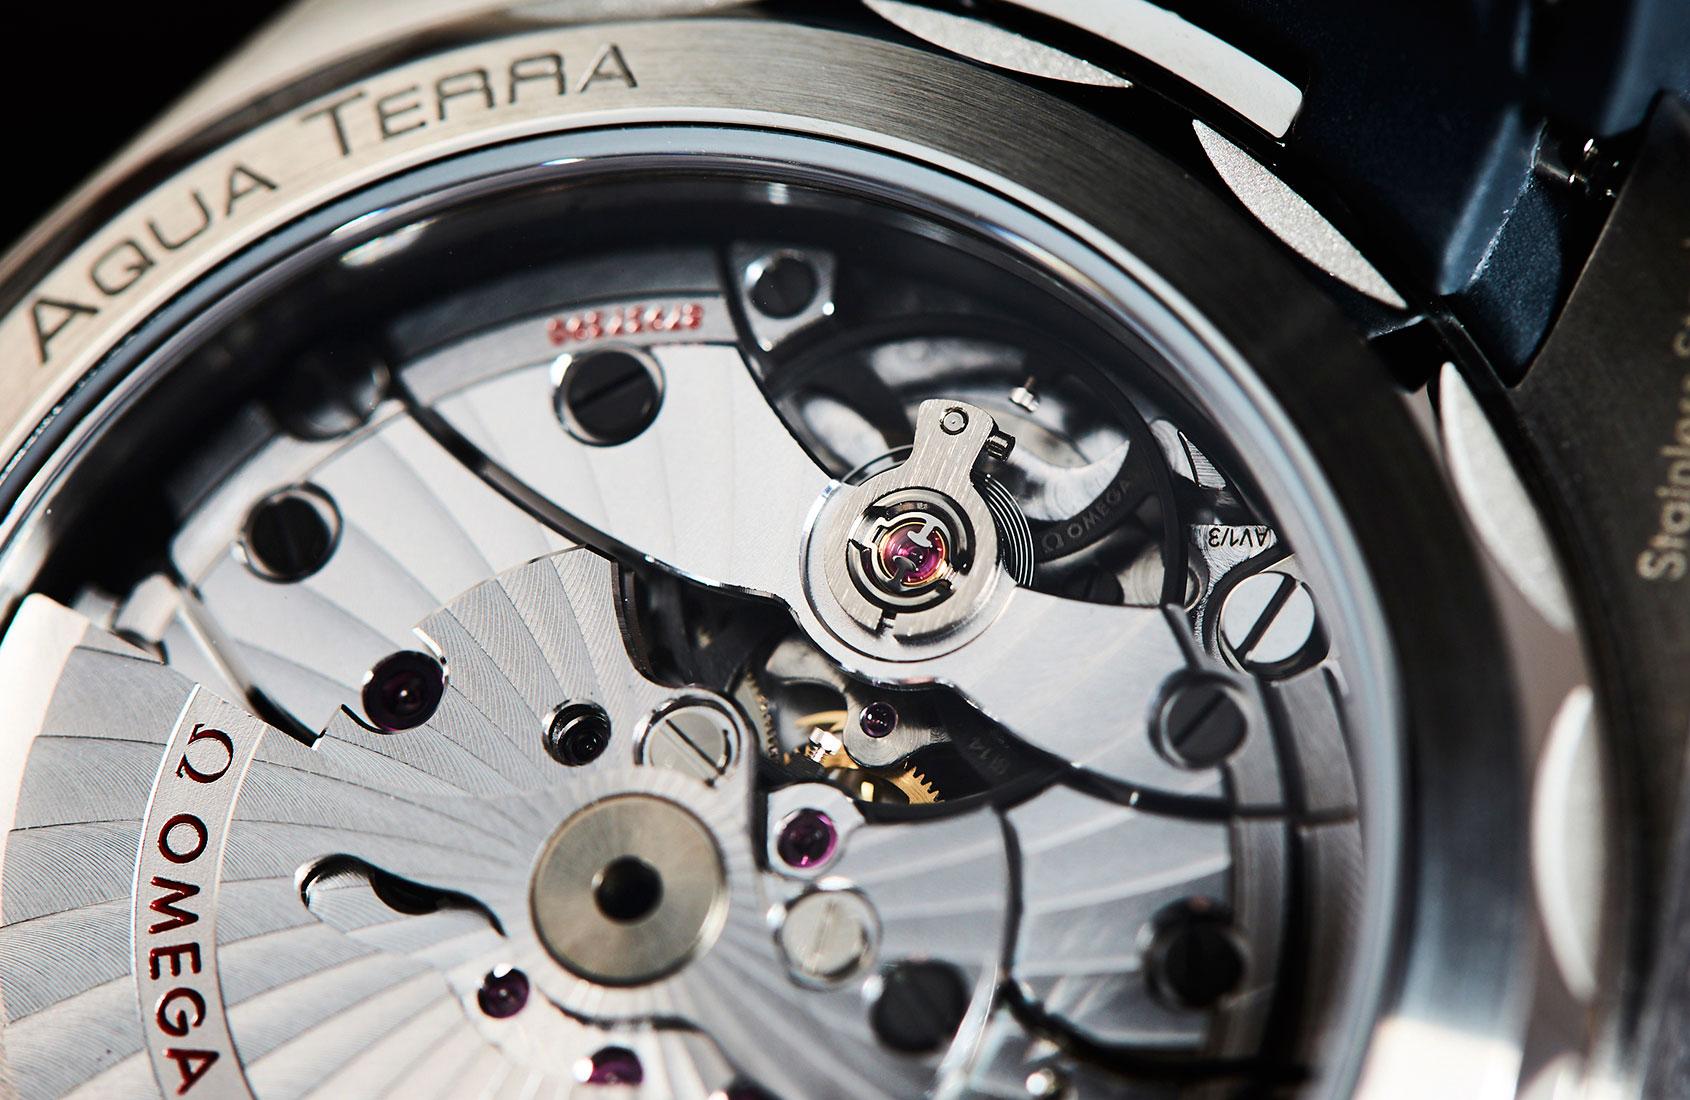 Omega Seamaster Aqua Terra Master Chronometer In Depth Review